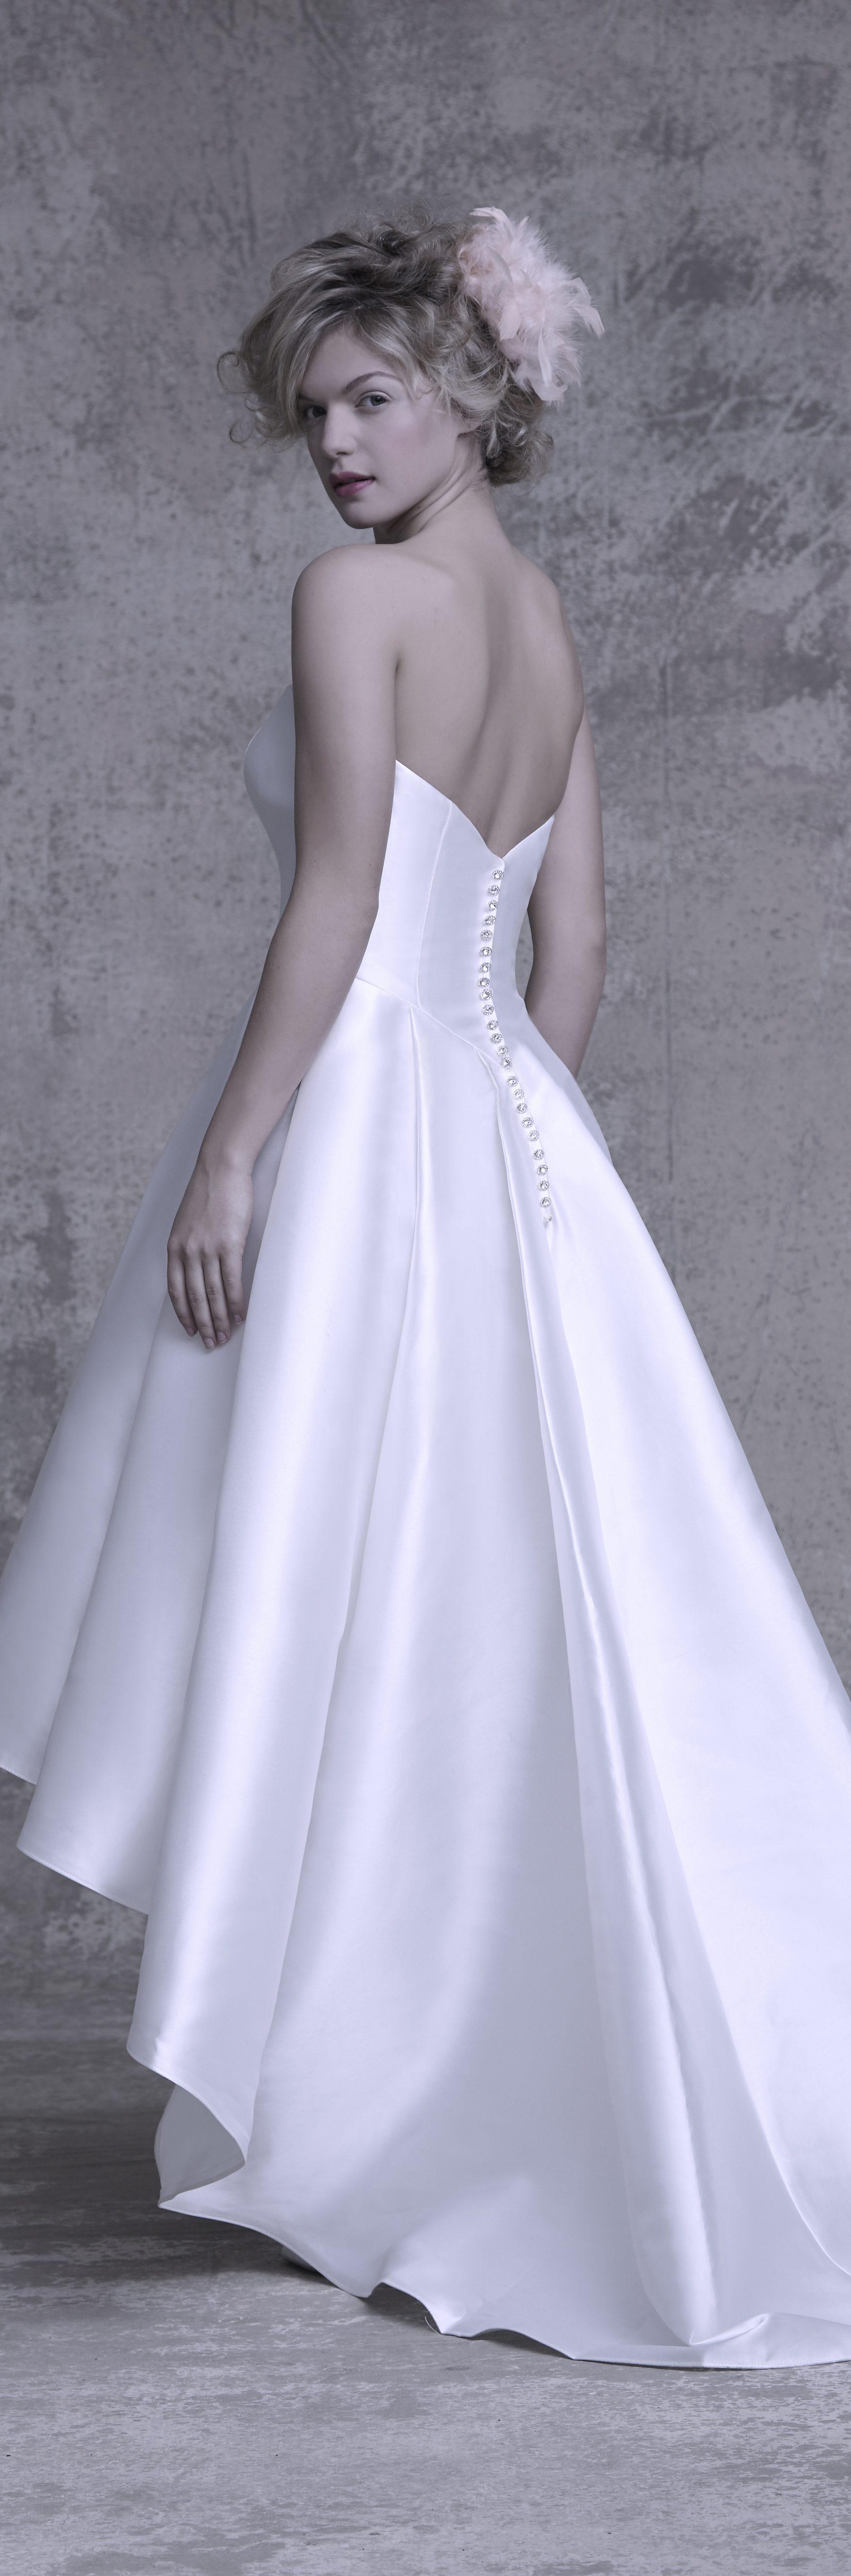 Design your own wedding dress.... - Bleu Bridal Gowns